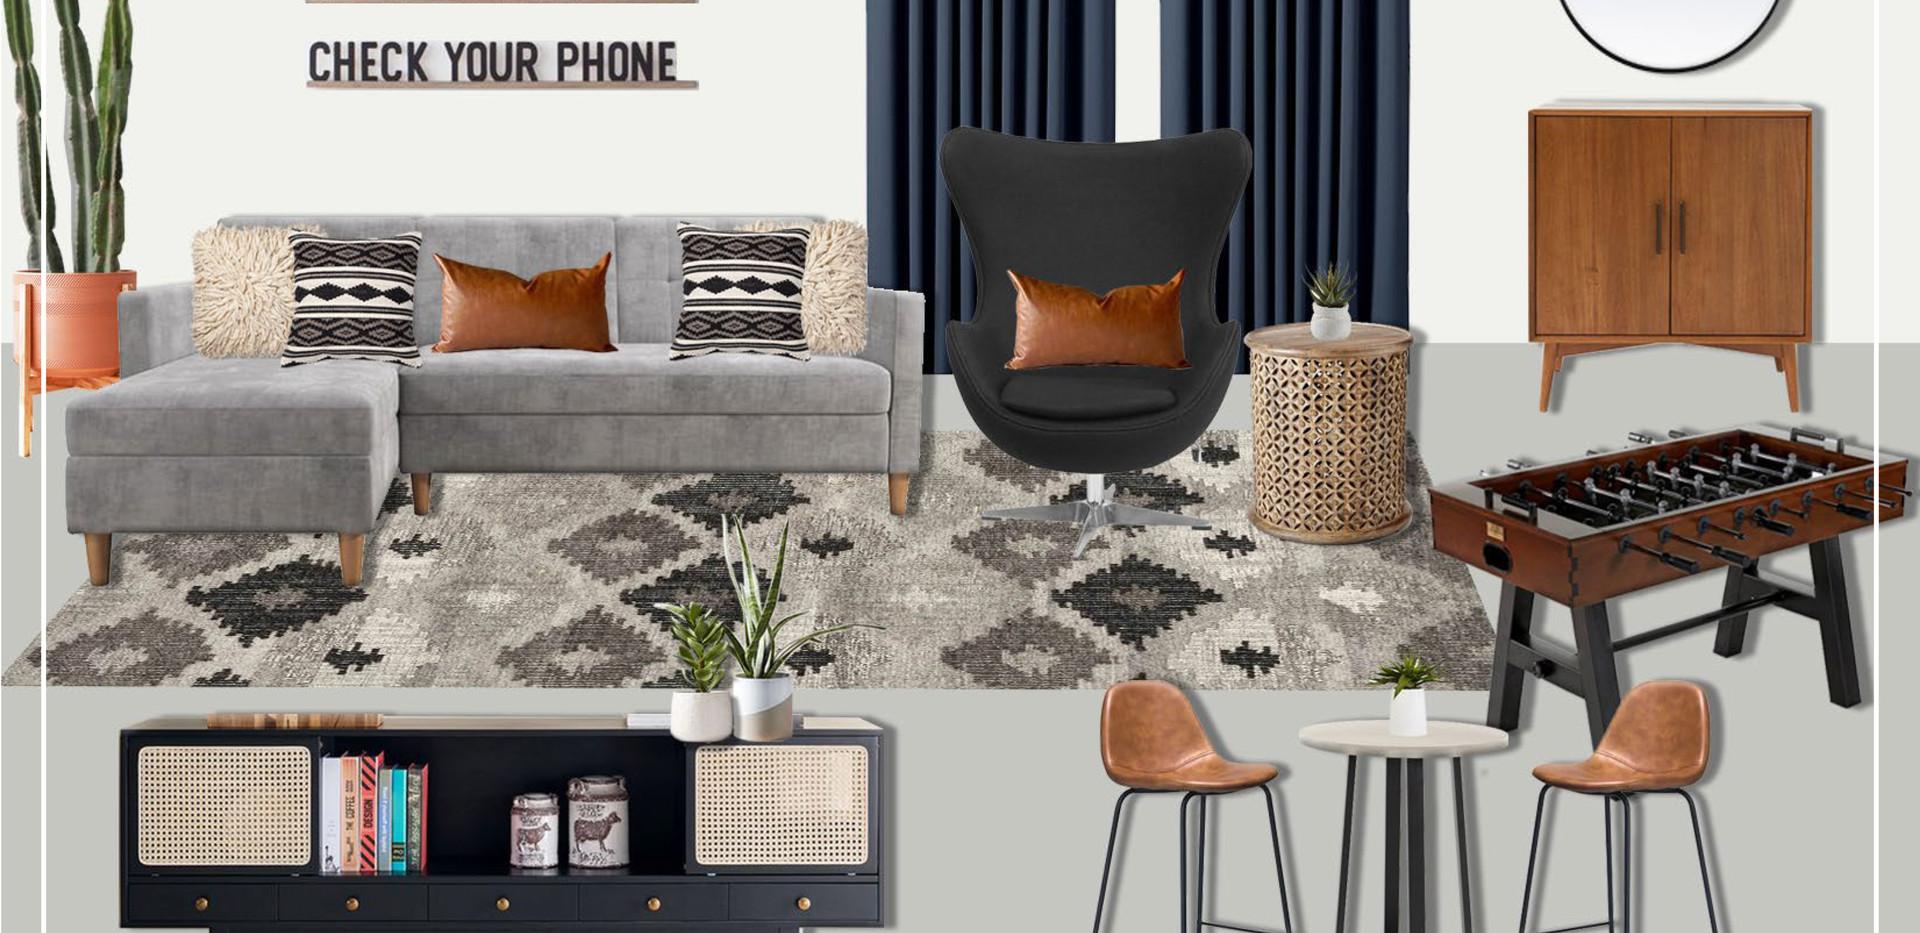 Guest House | Original Concept Collage